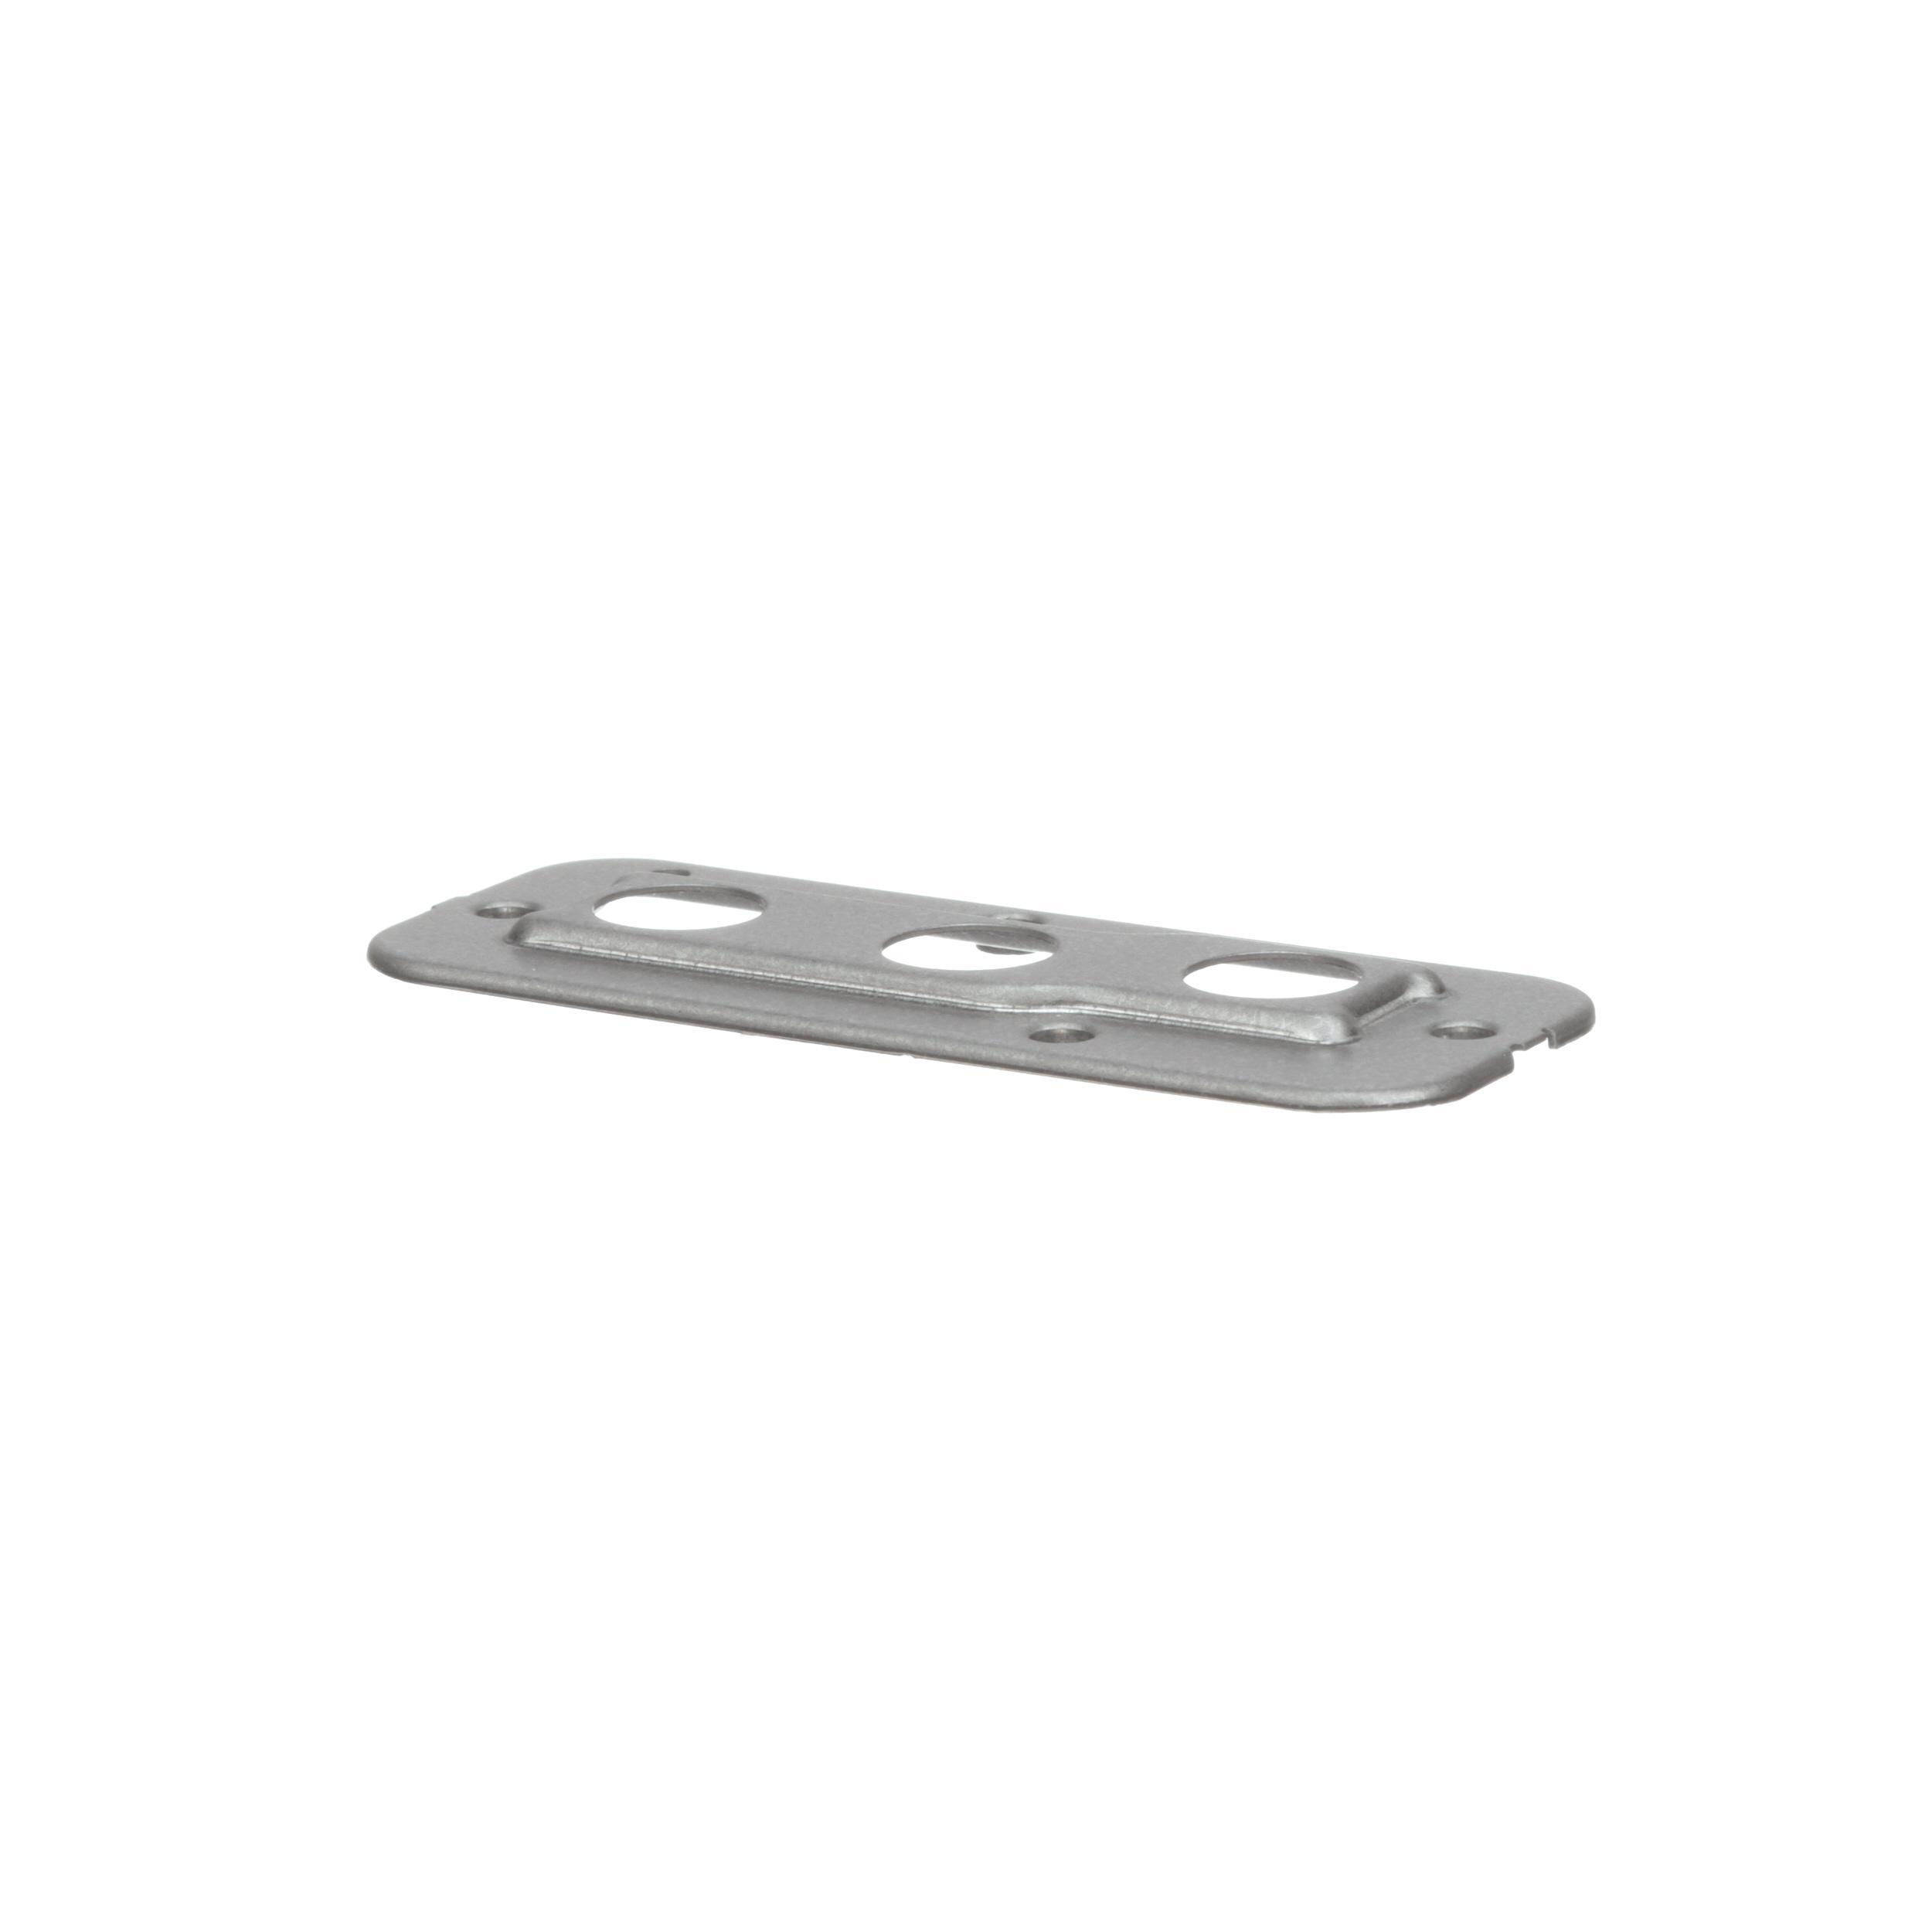 RINNAI ELECTRODE BRACKET RL75/94I/E (VC)